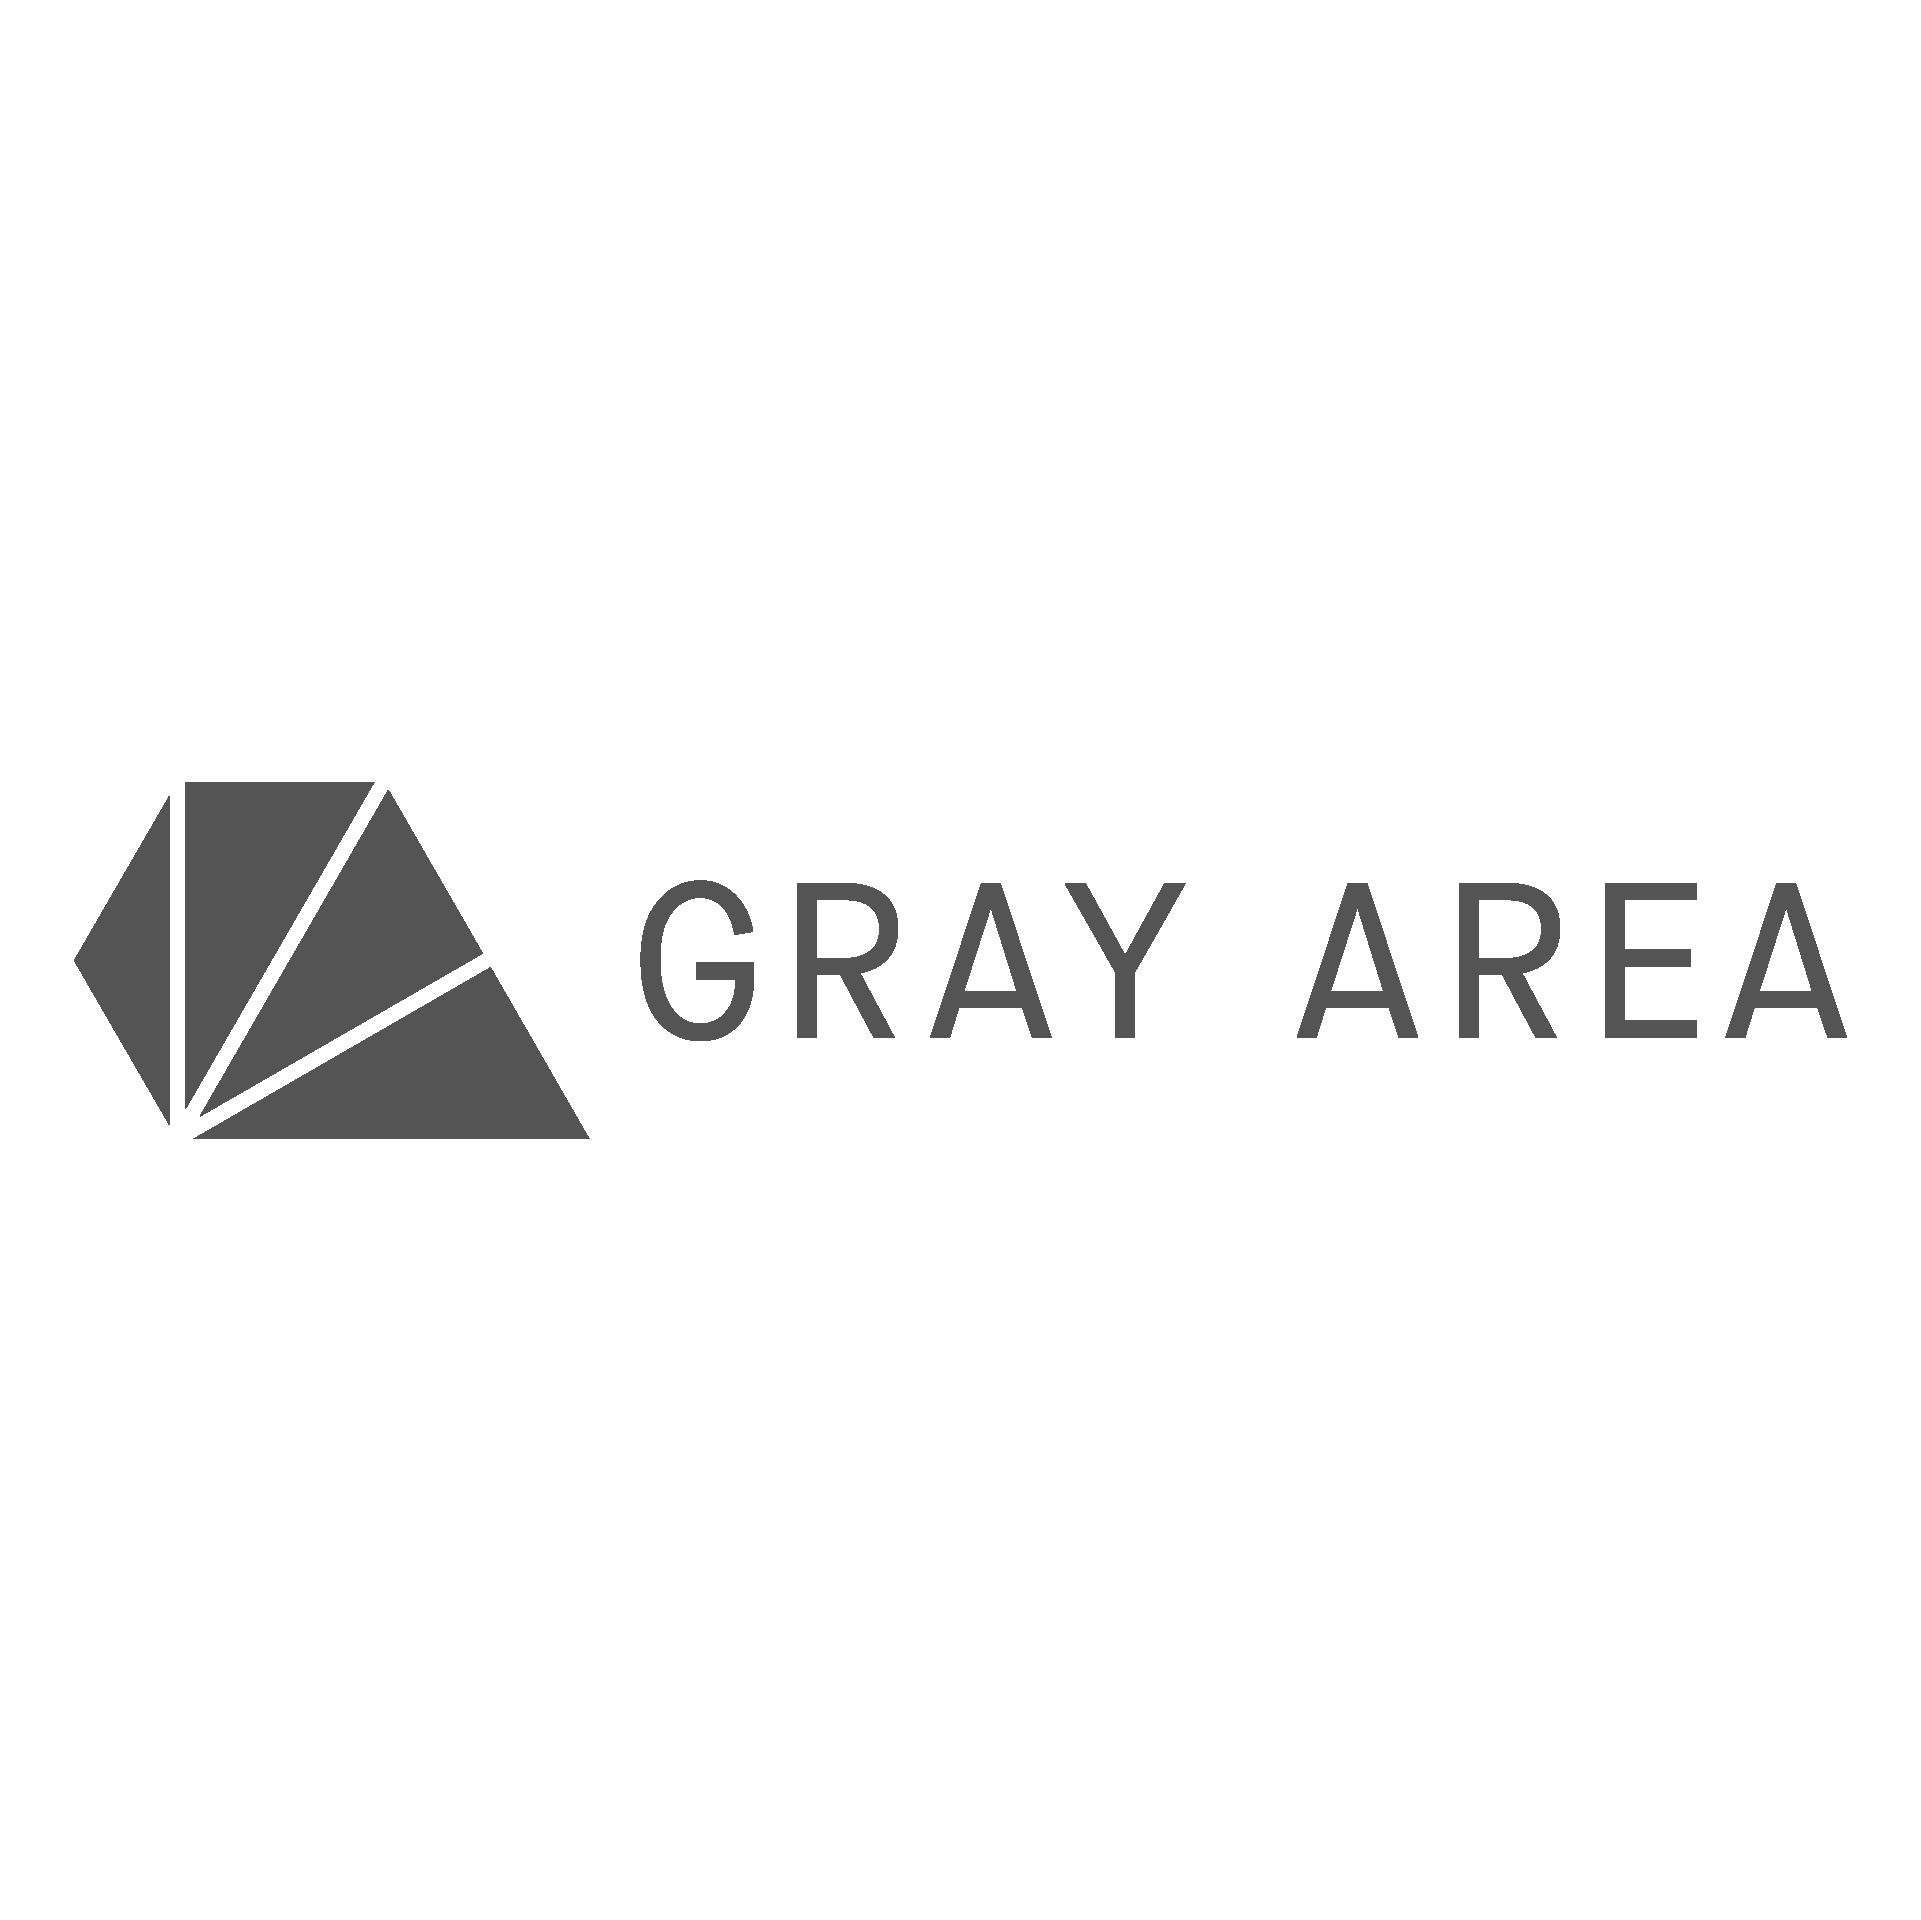 Grayarea logo dark